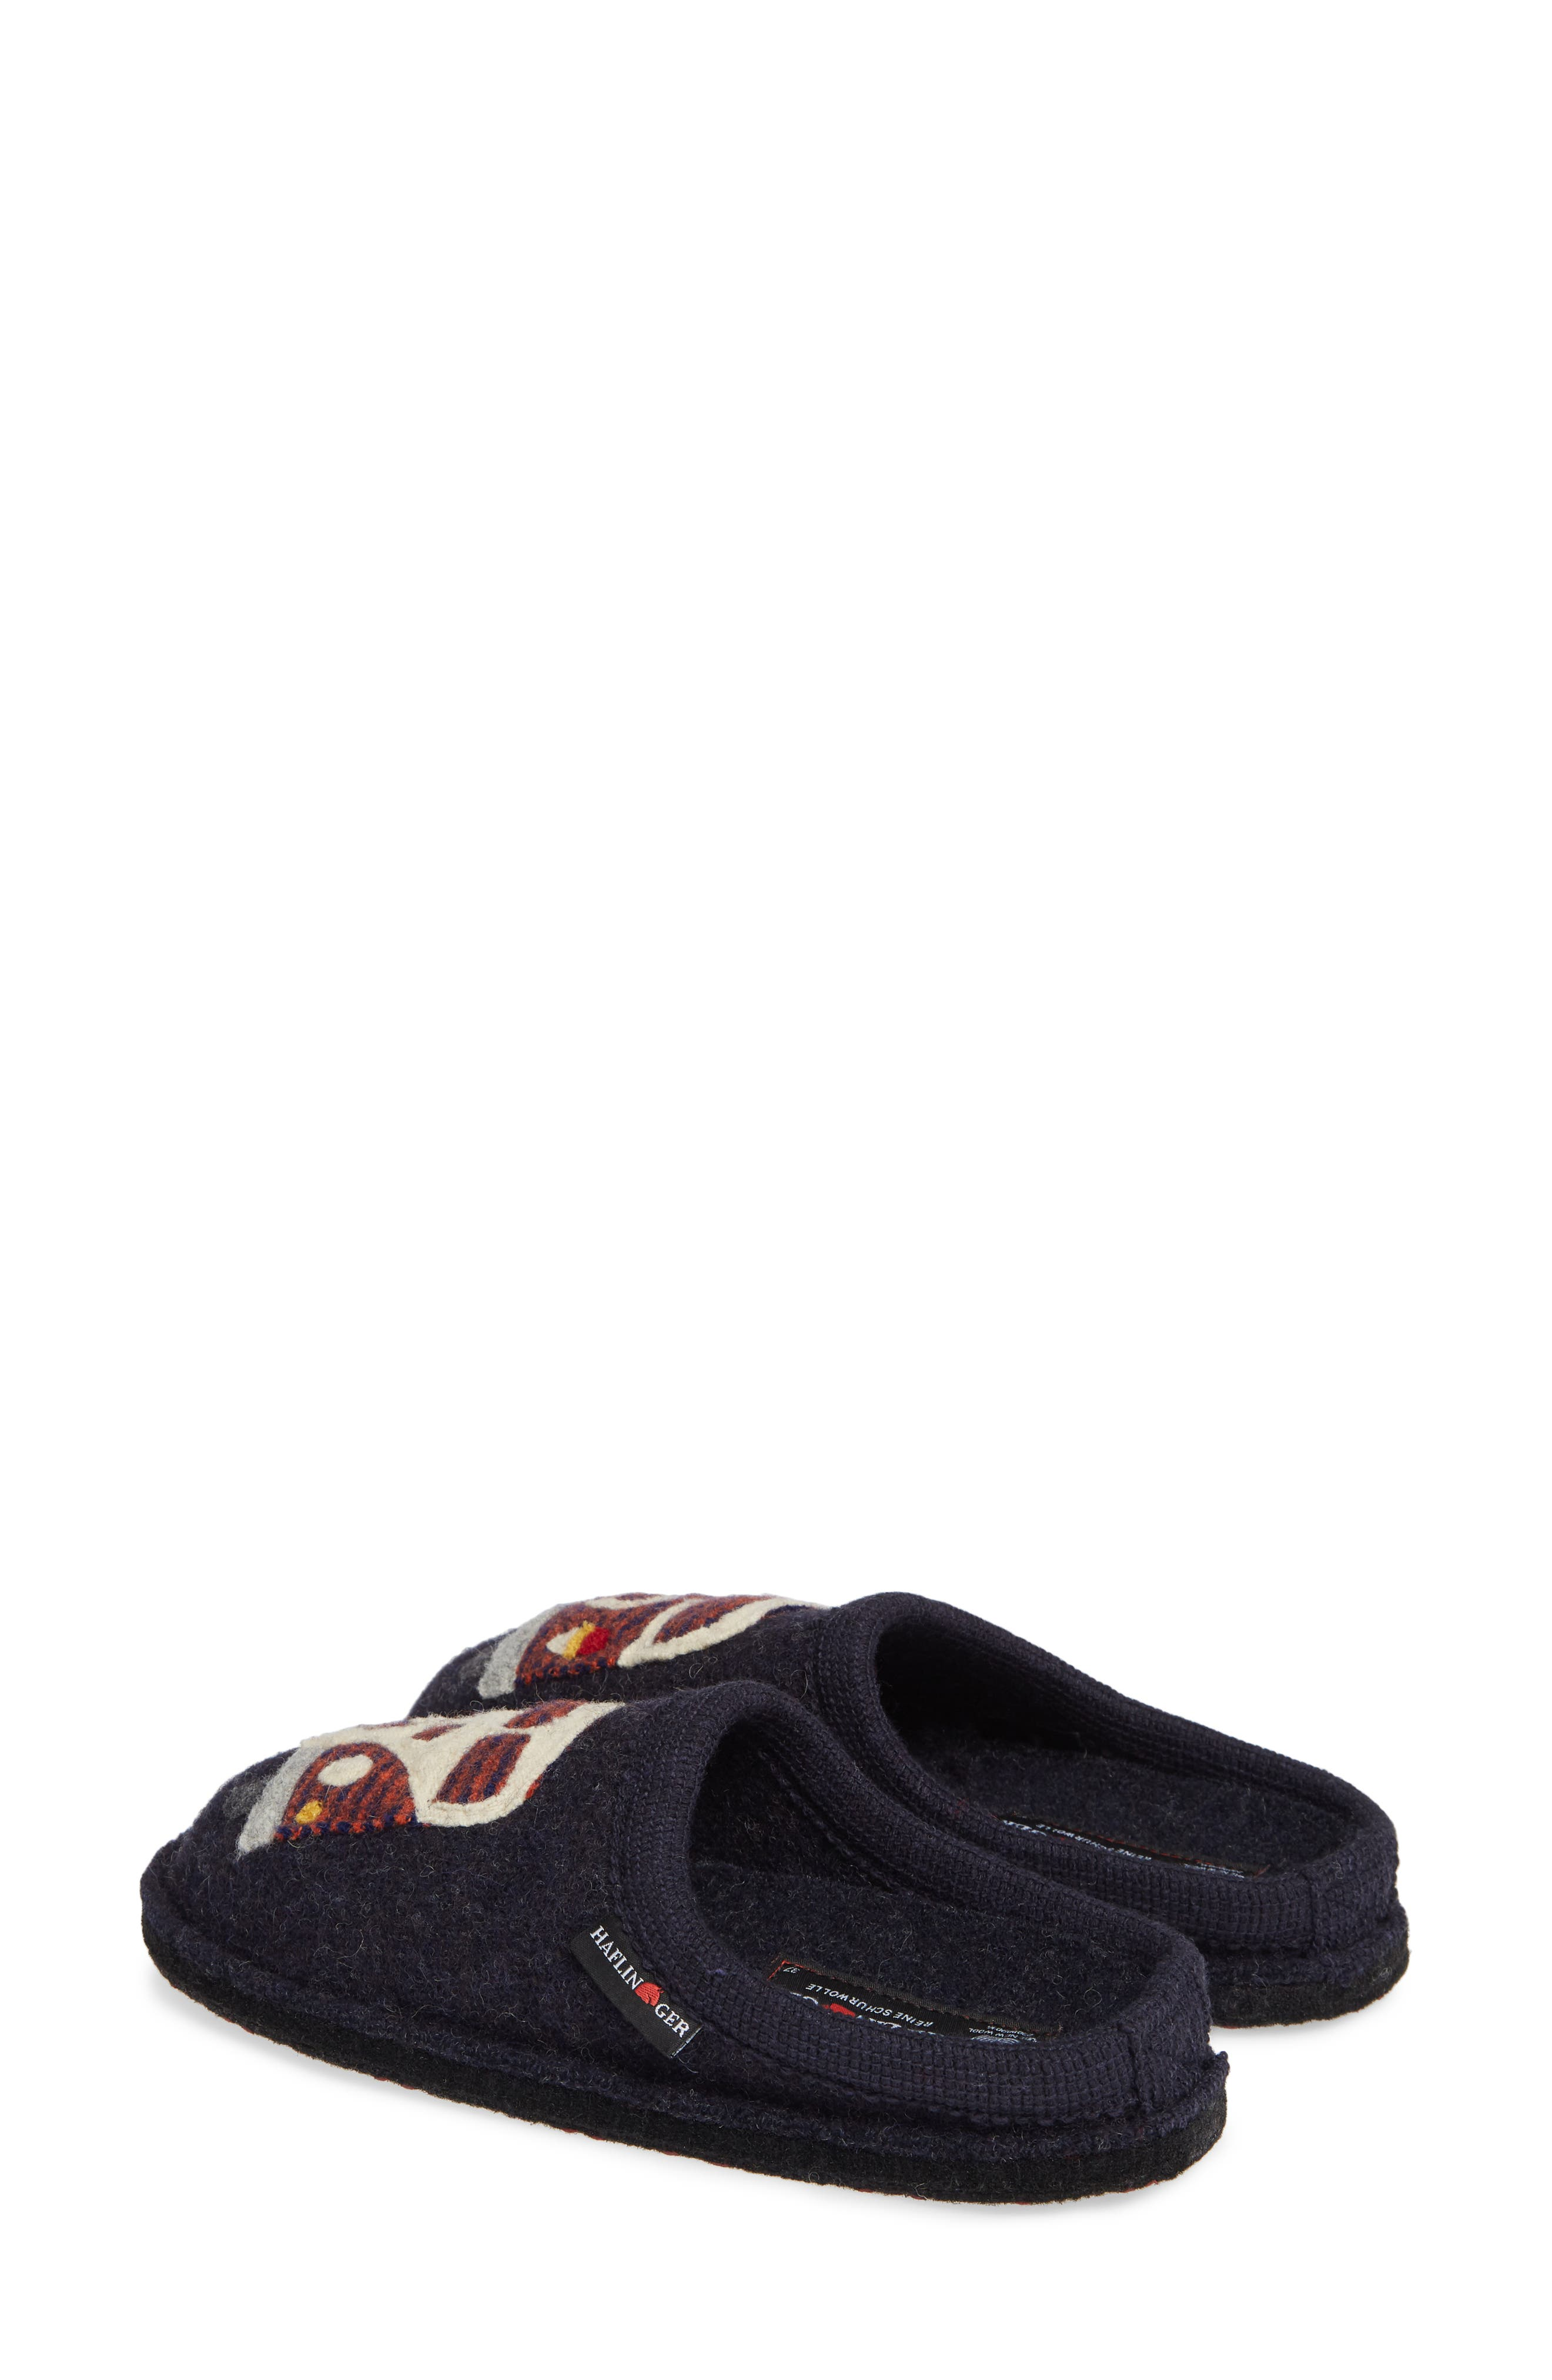 low price fe700 55c15 Women s Haflinger Shoes   Nordstrom